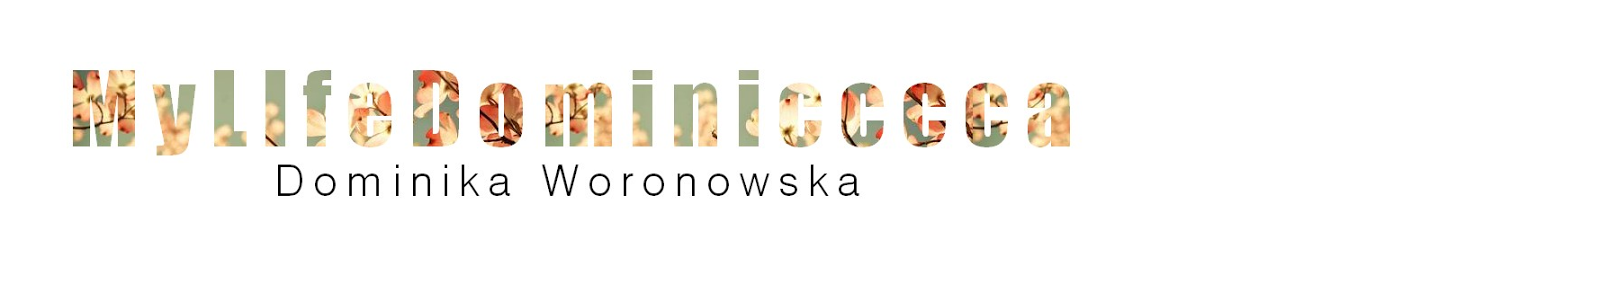 Dominika Woronowska